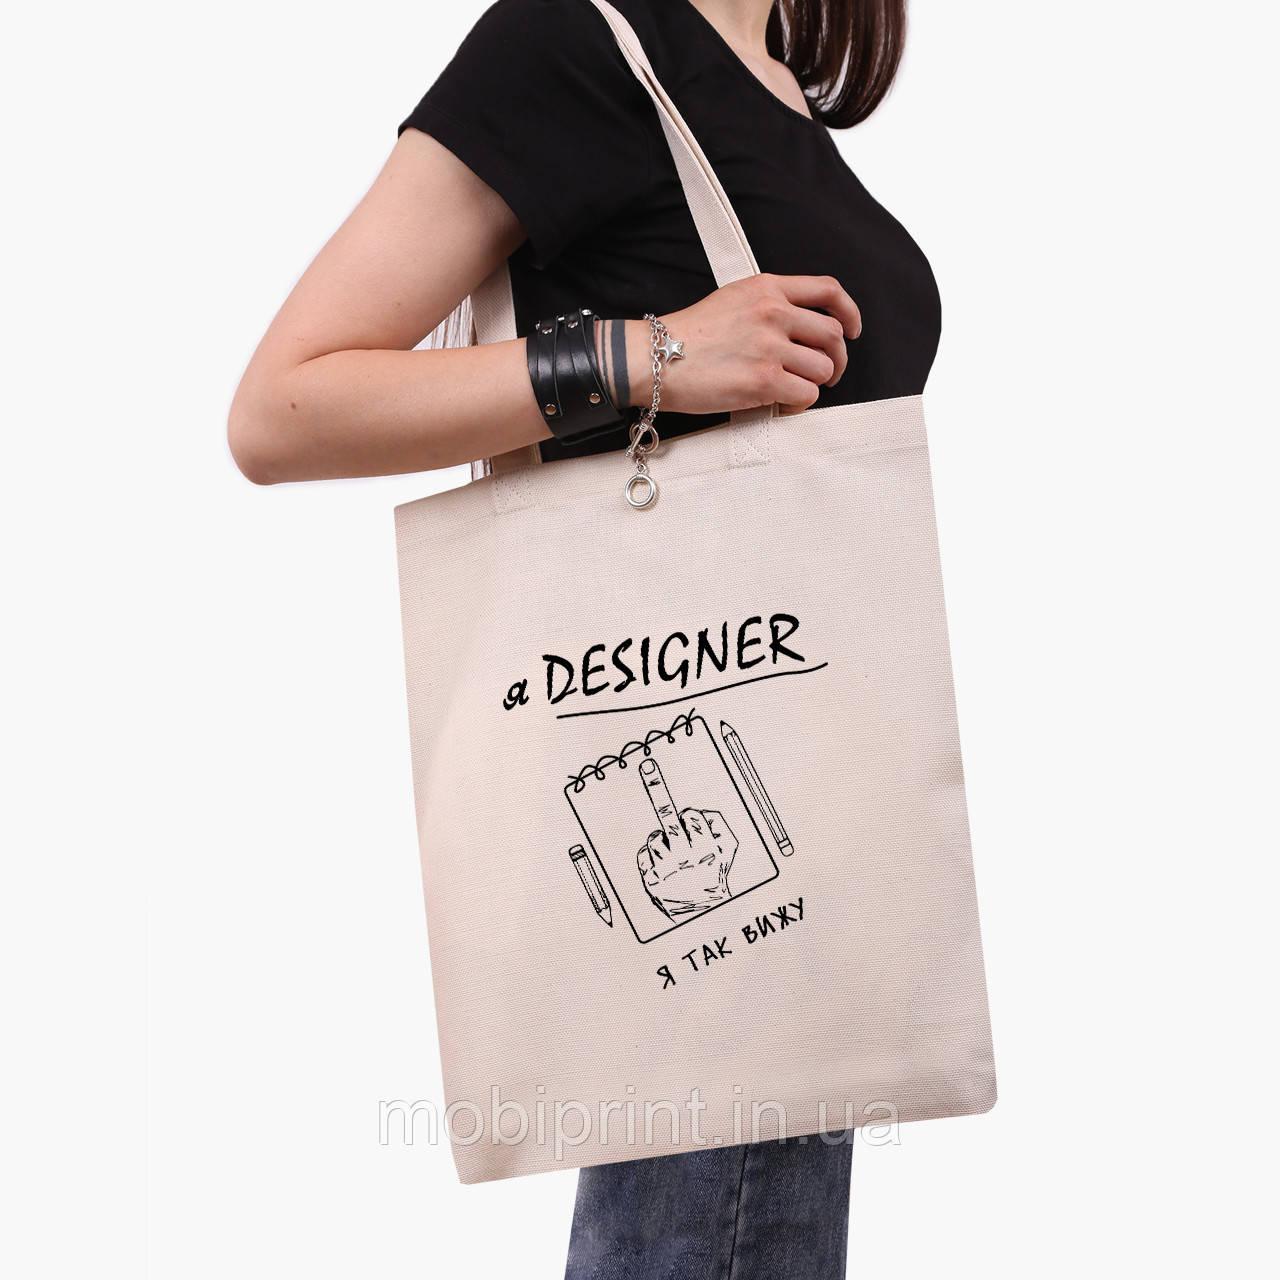 Еко сумка шоппер Я дизайнер я так бачу (I am a designer as I see it) (9227-1545) екосумка шопер 41*35 см